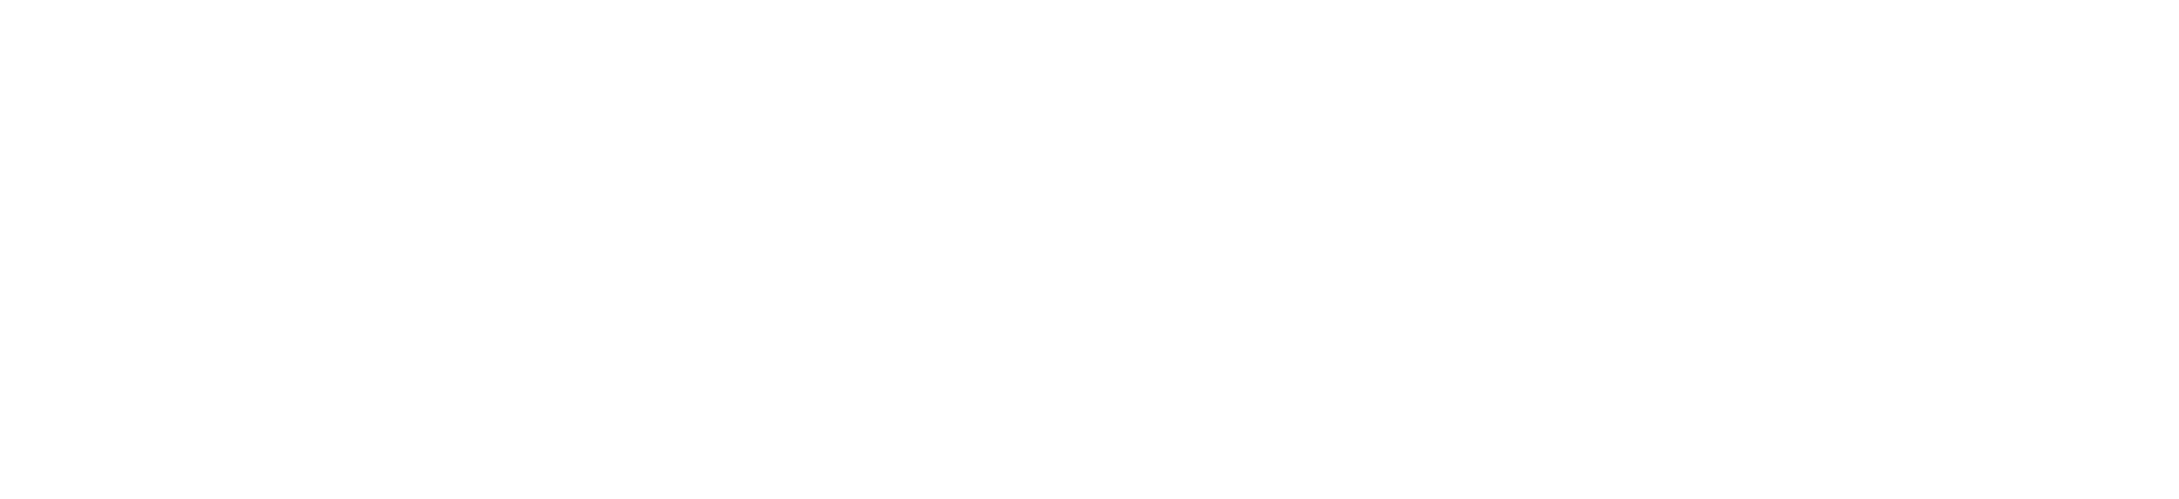 QDK - Quartier für Digitale Kultur